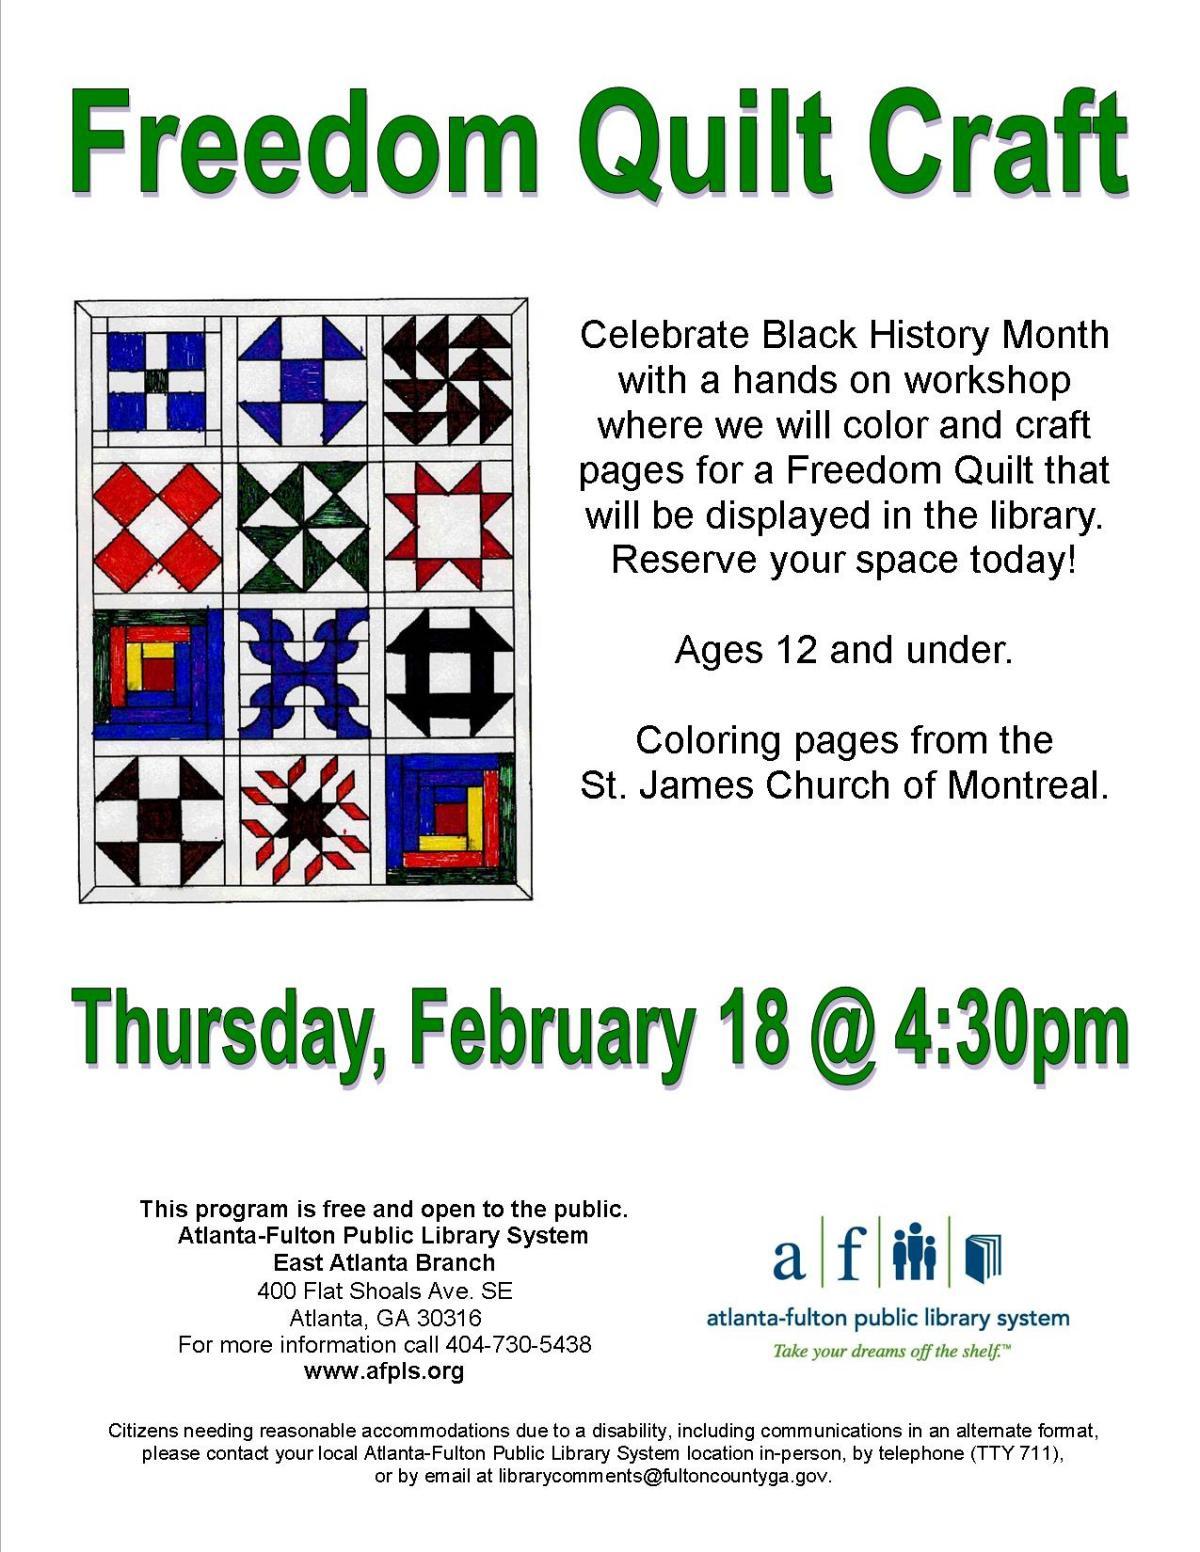 Freedom Quilt Craft Atlanta Events Calendar Social Web